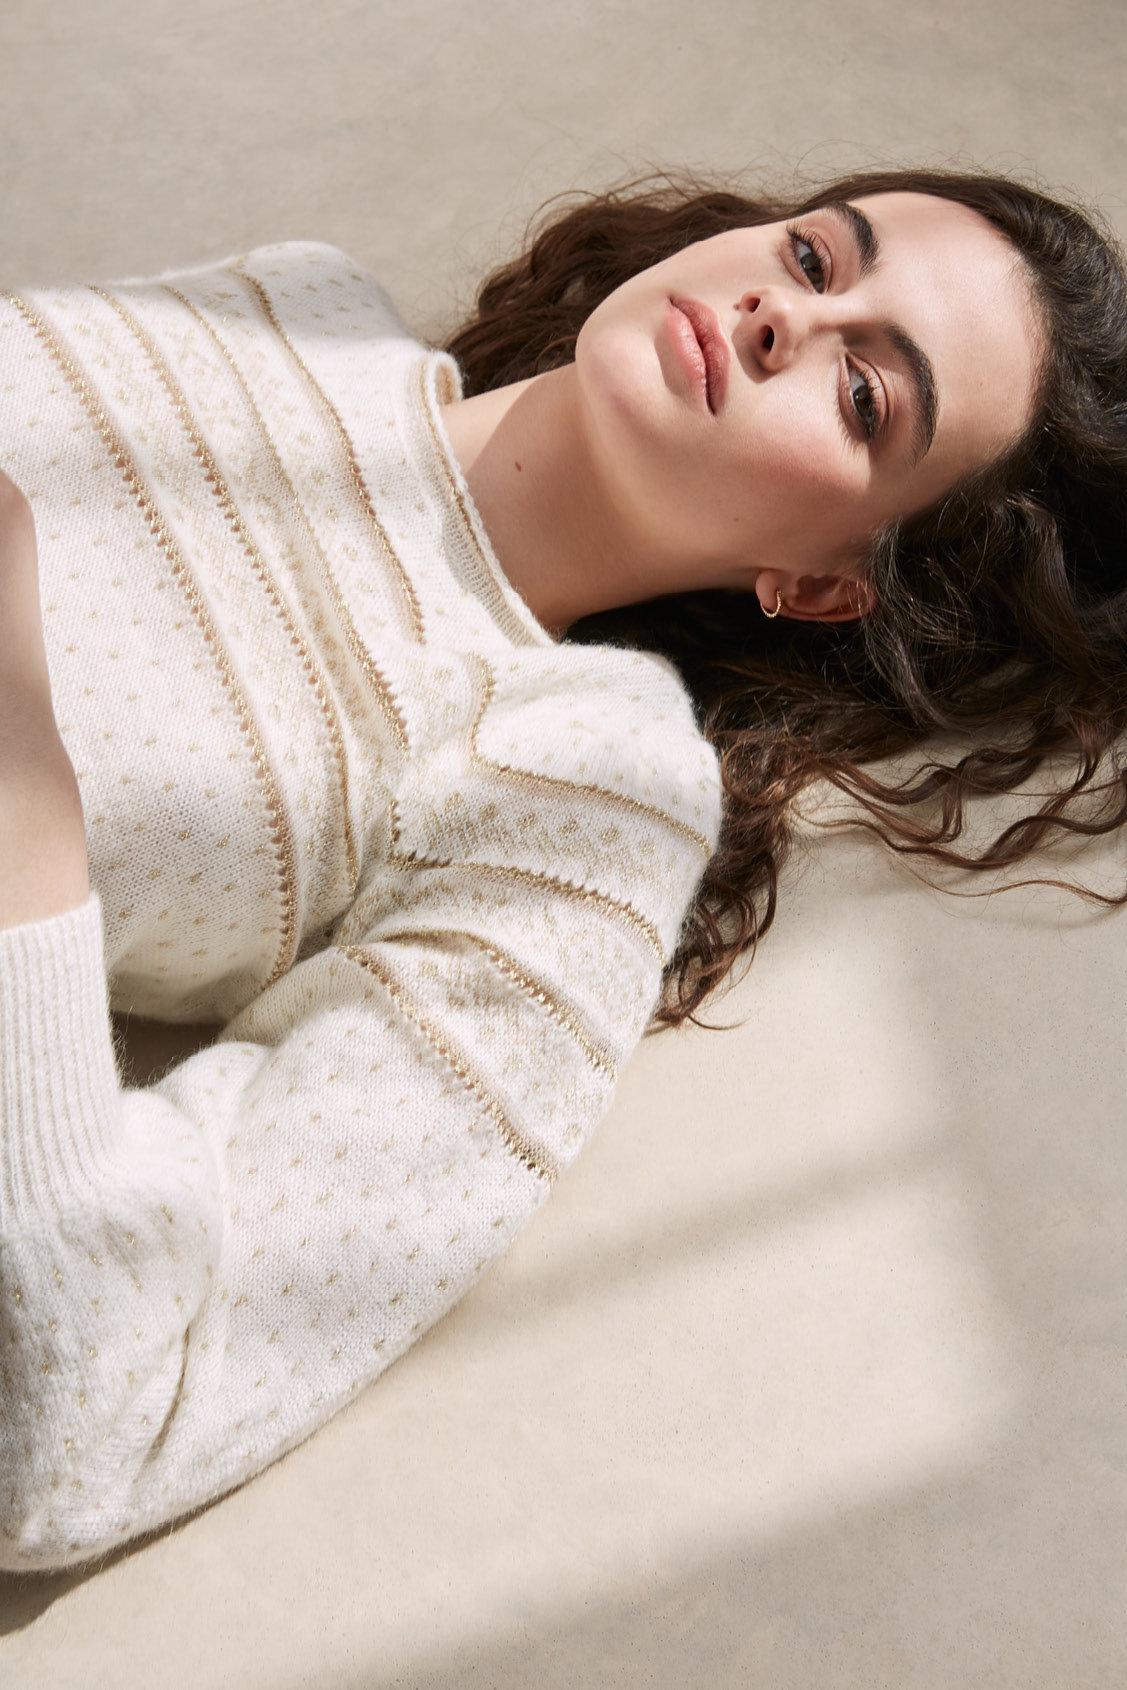 Hemstitched mohair jumper with lurex patterns